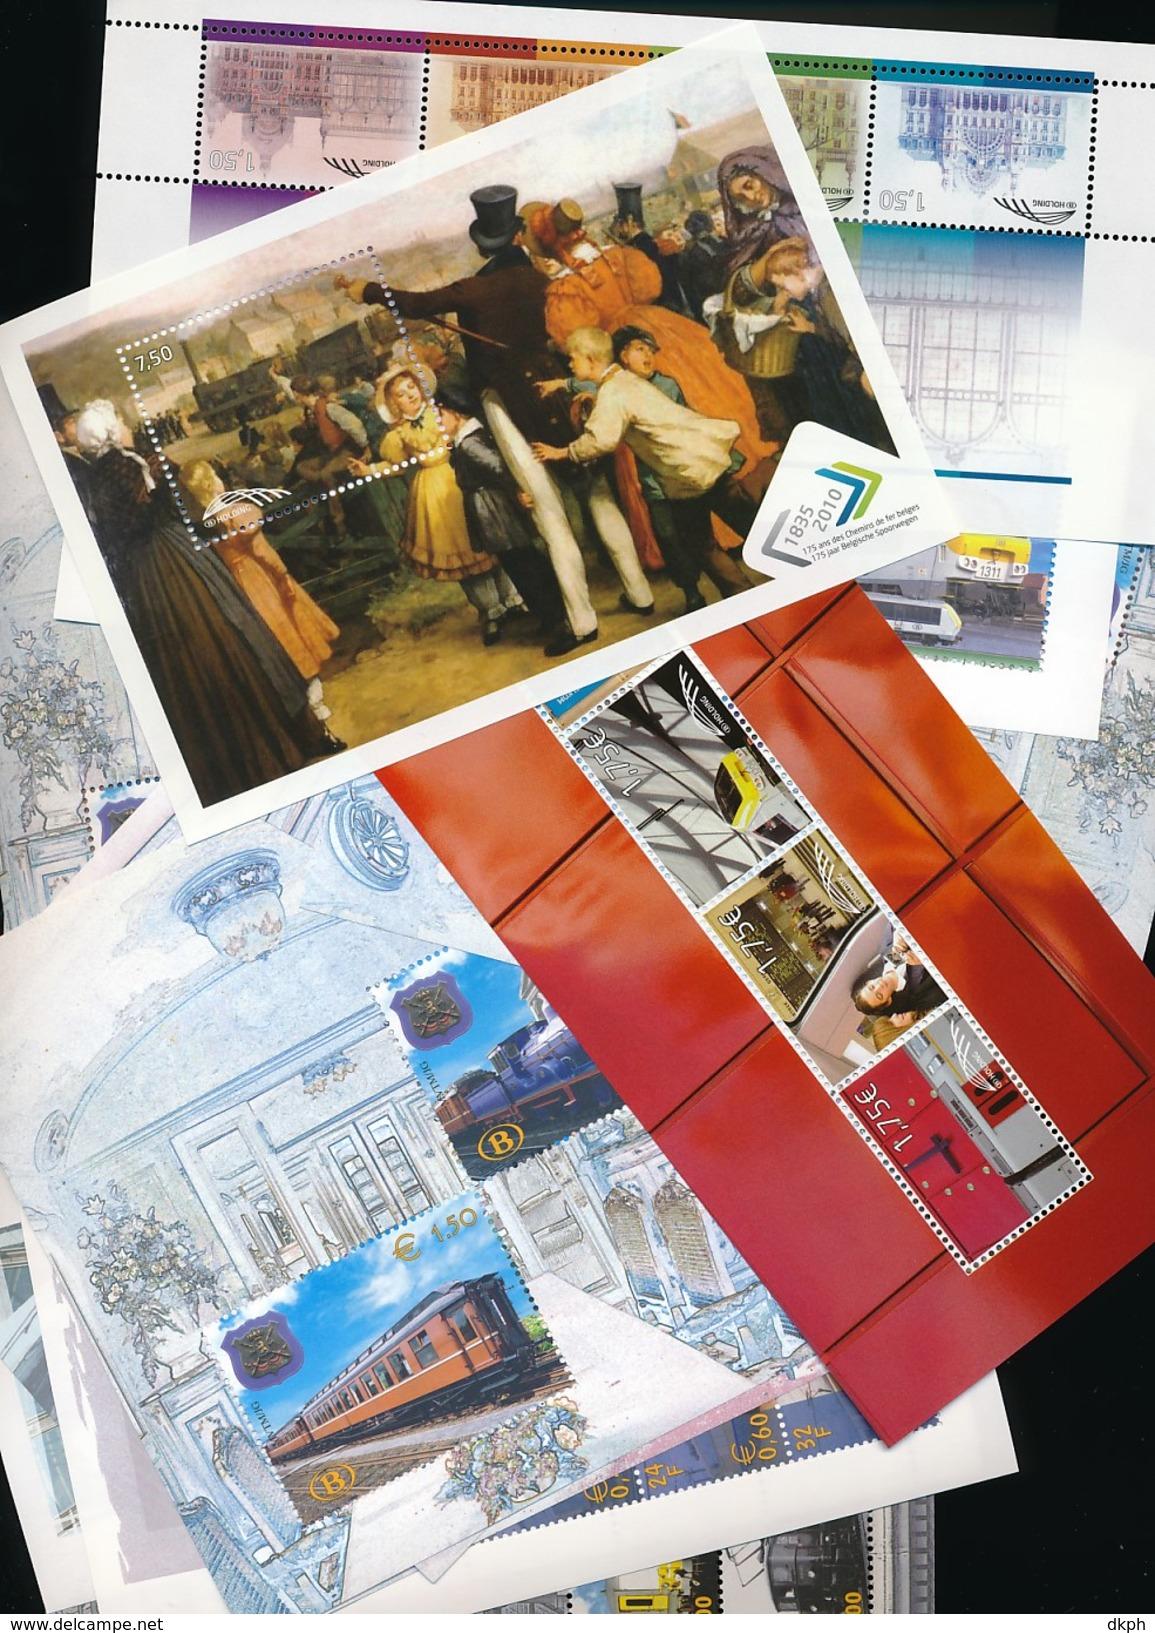 BELGIQUE LOT DE 104.50 EUROS DE  FACIALE QUE DES TIMBRES EN EUROS CHEMIN DE FER - Collections